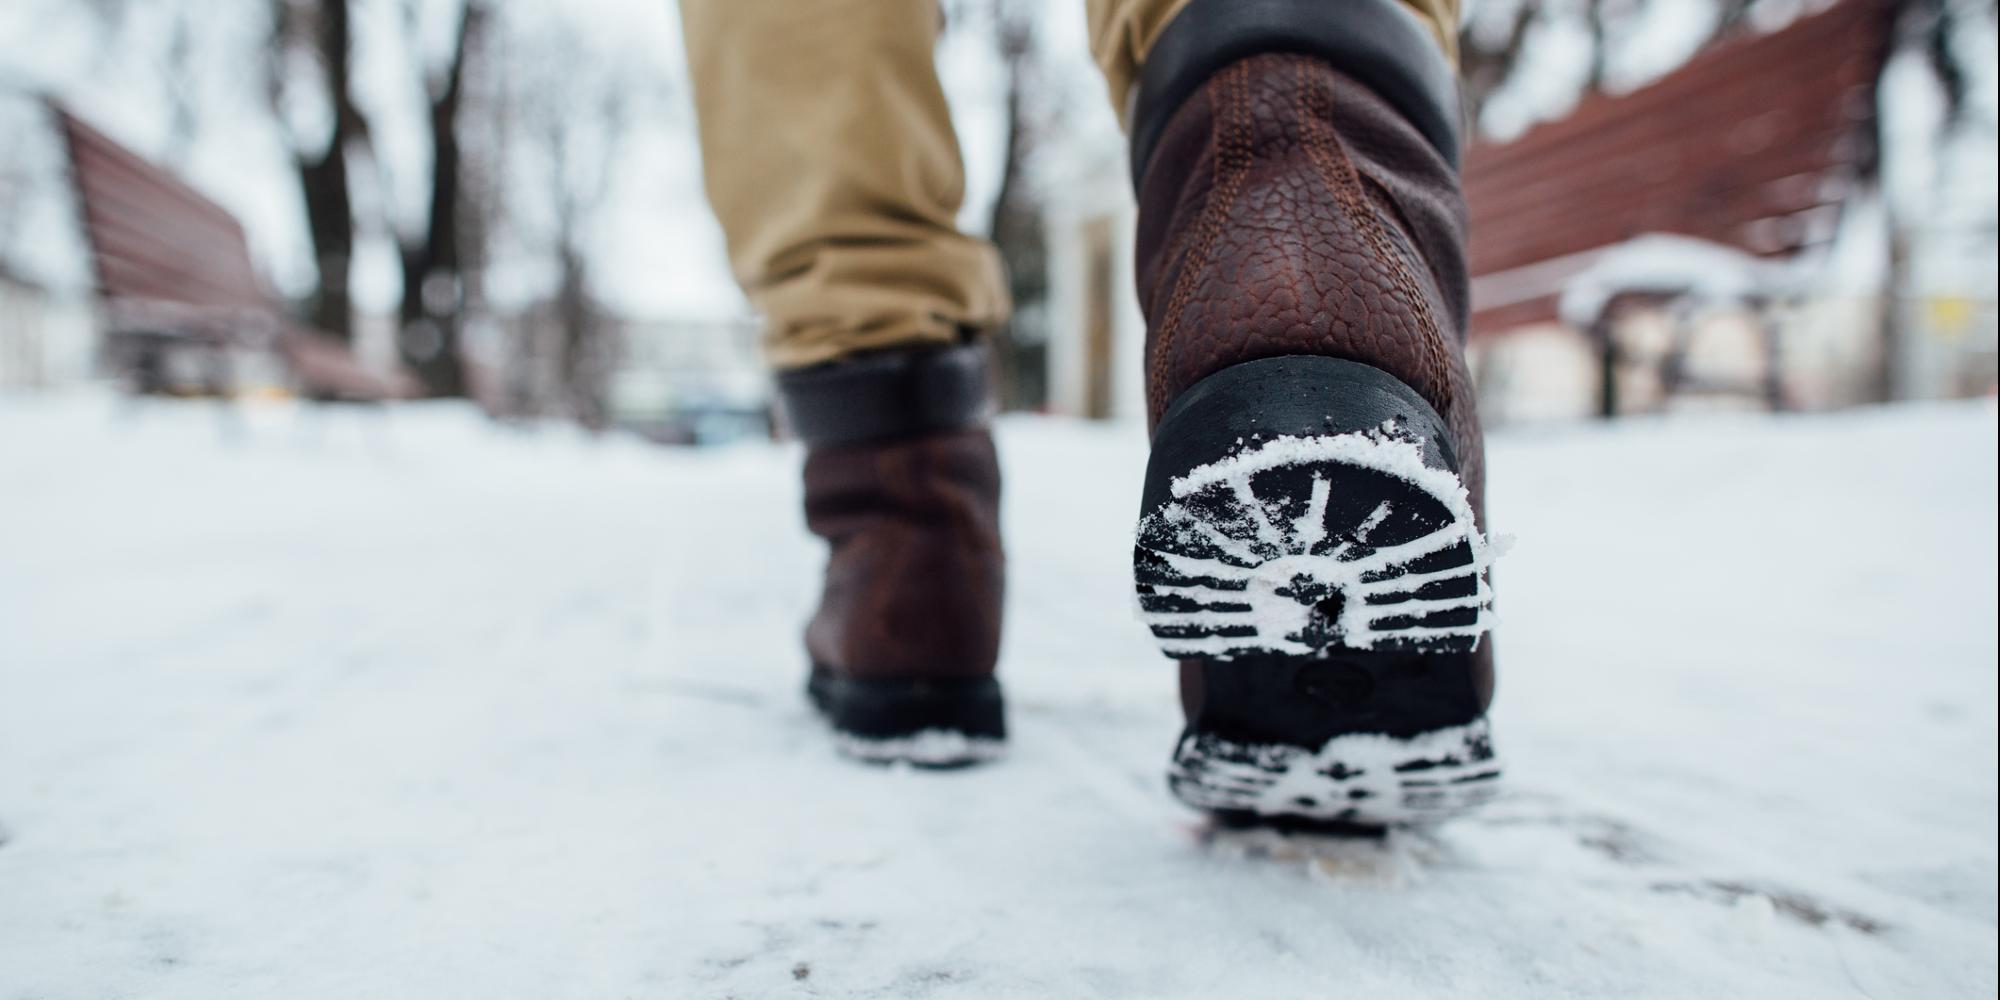 WOL PRO Blog - Winter Safety PPE